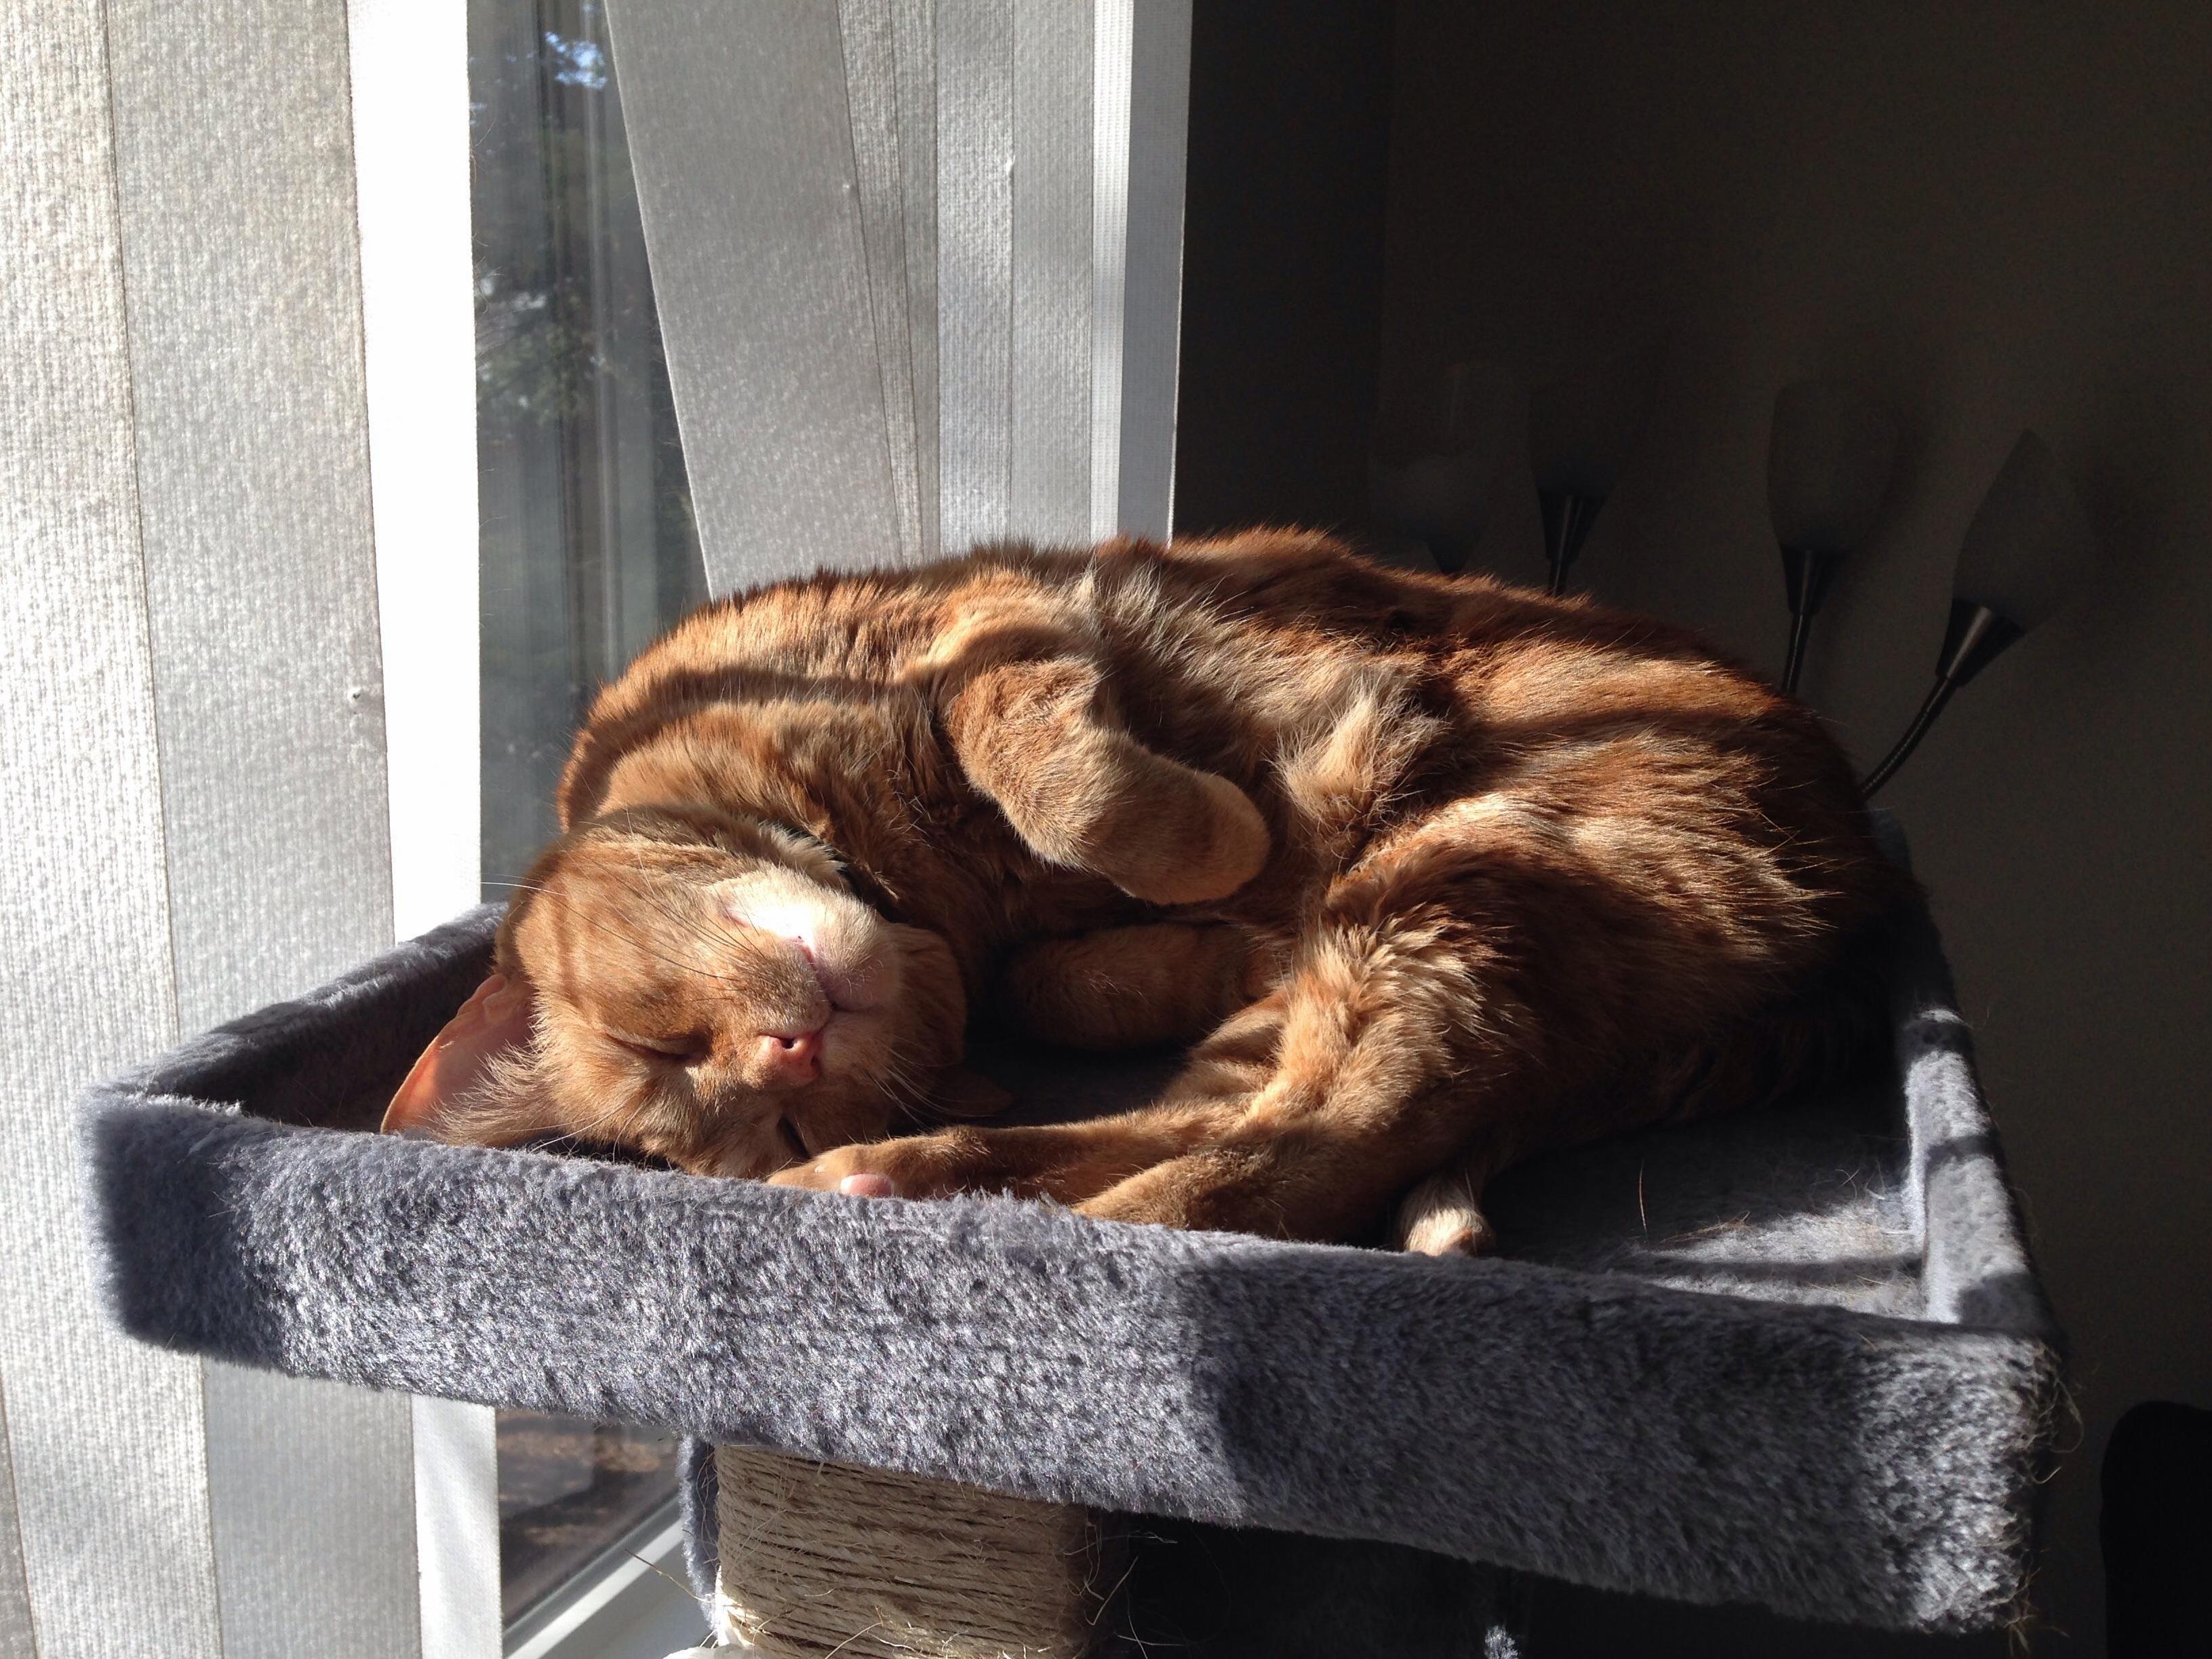 Jimmy likes sunbathing